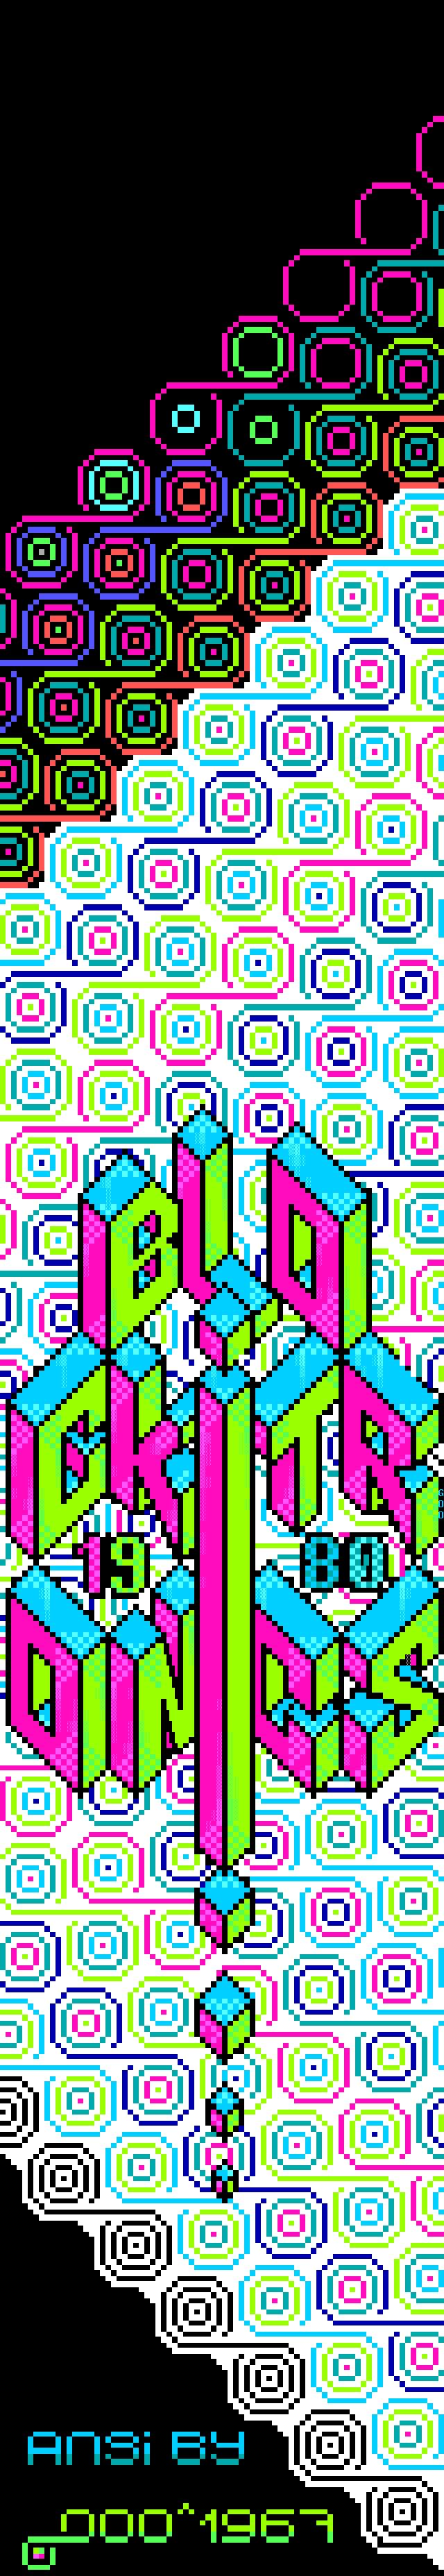 goo-block80s.xb